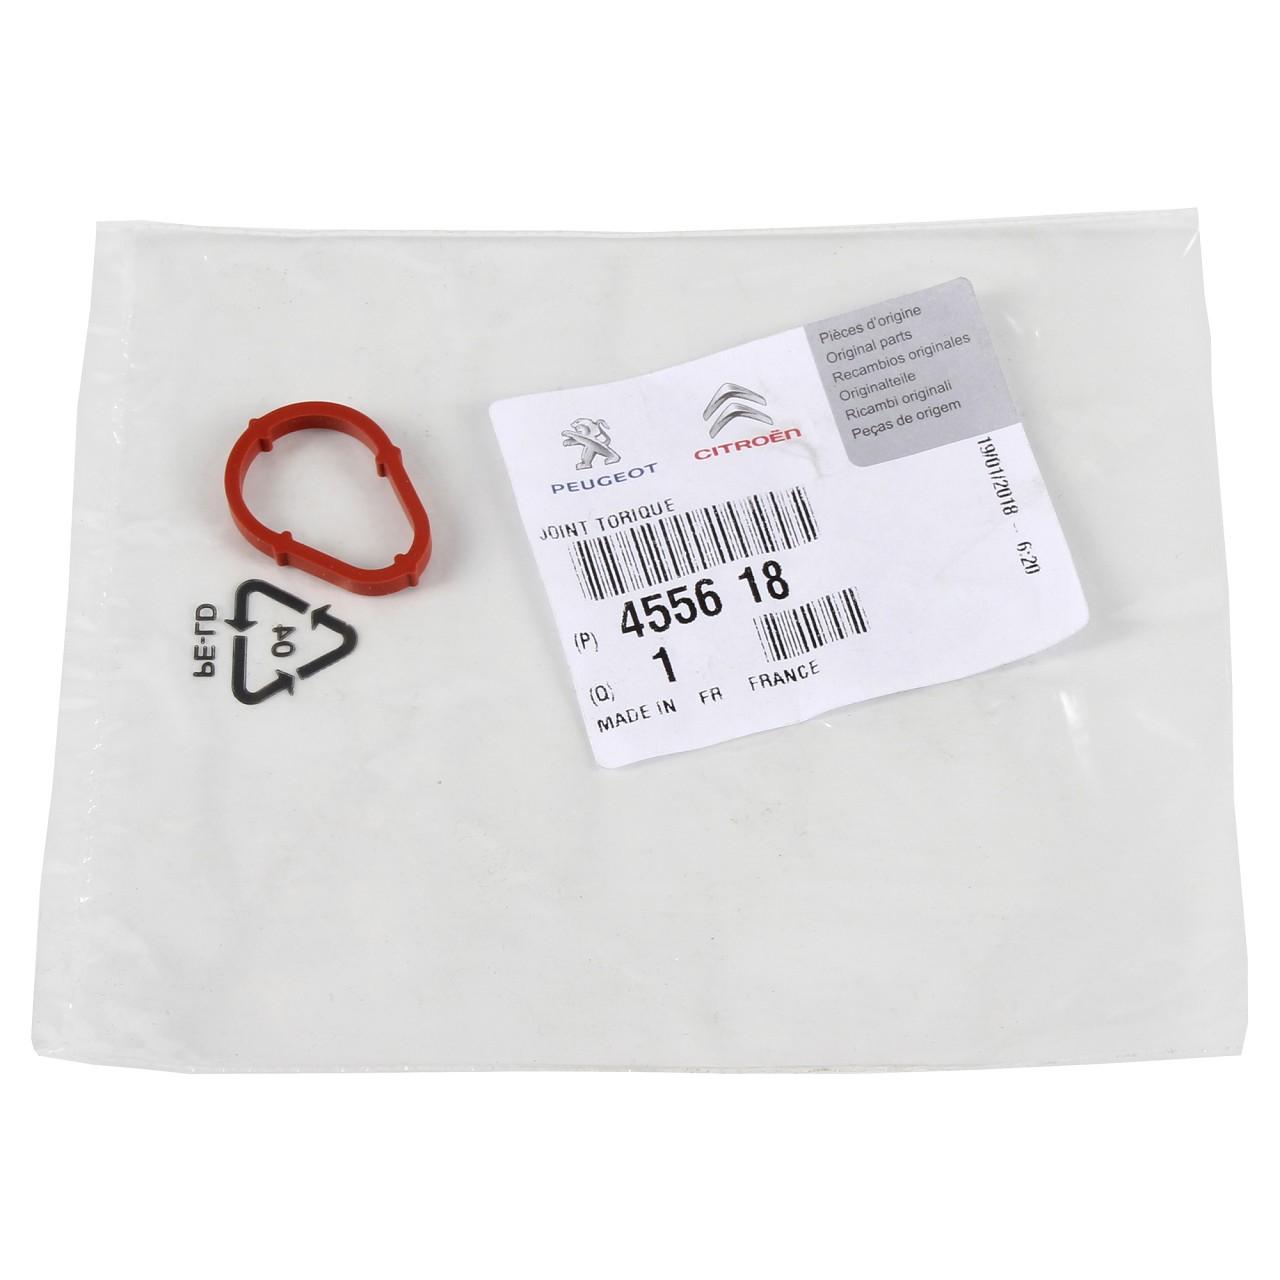 ORIGINAL Citroen Peugeot Dichtung O-Ring für Unterdruckpumpe Vakuumpumpe 4556.18